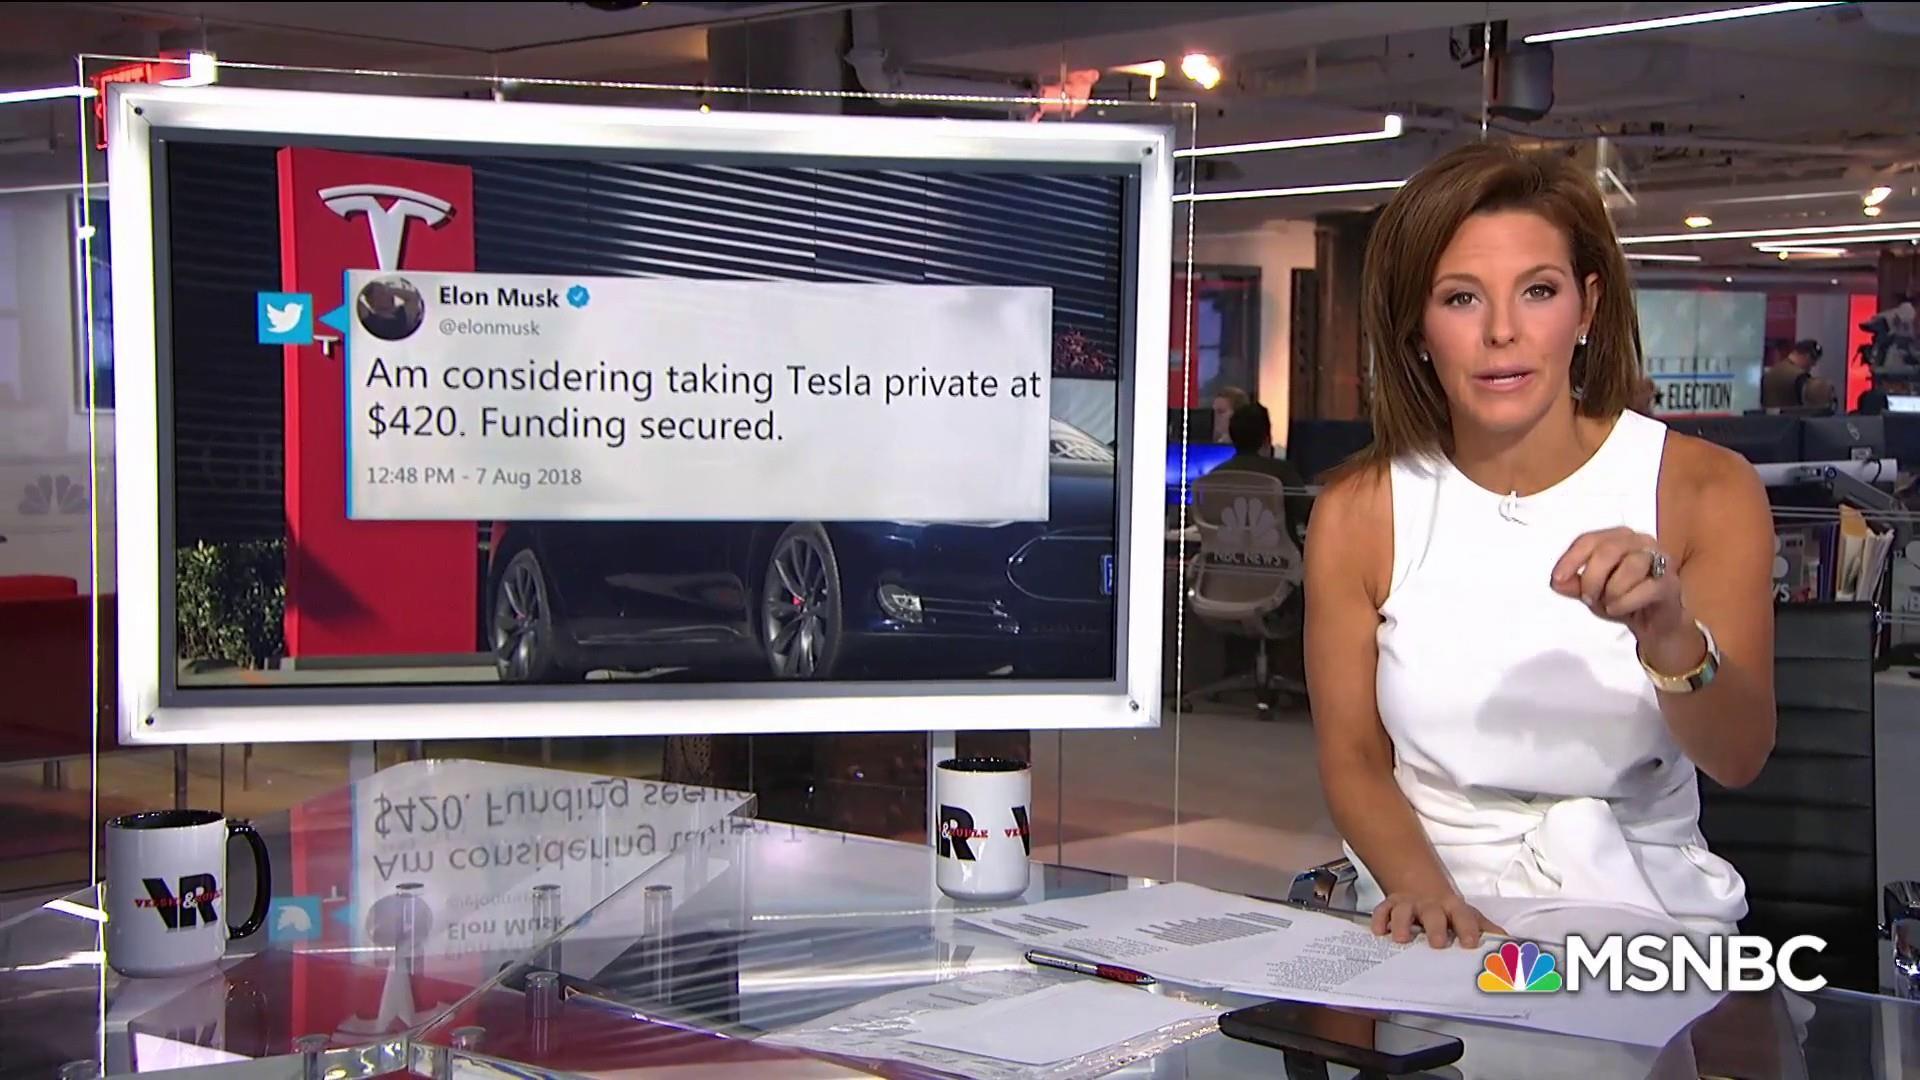 Elon Musk said he may privatize Tesla, then stocks soared